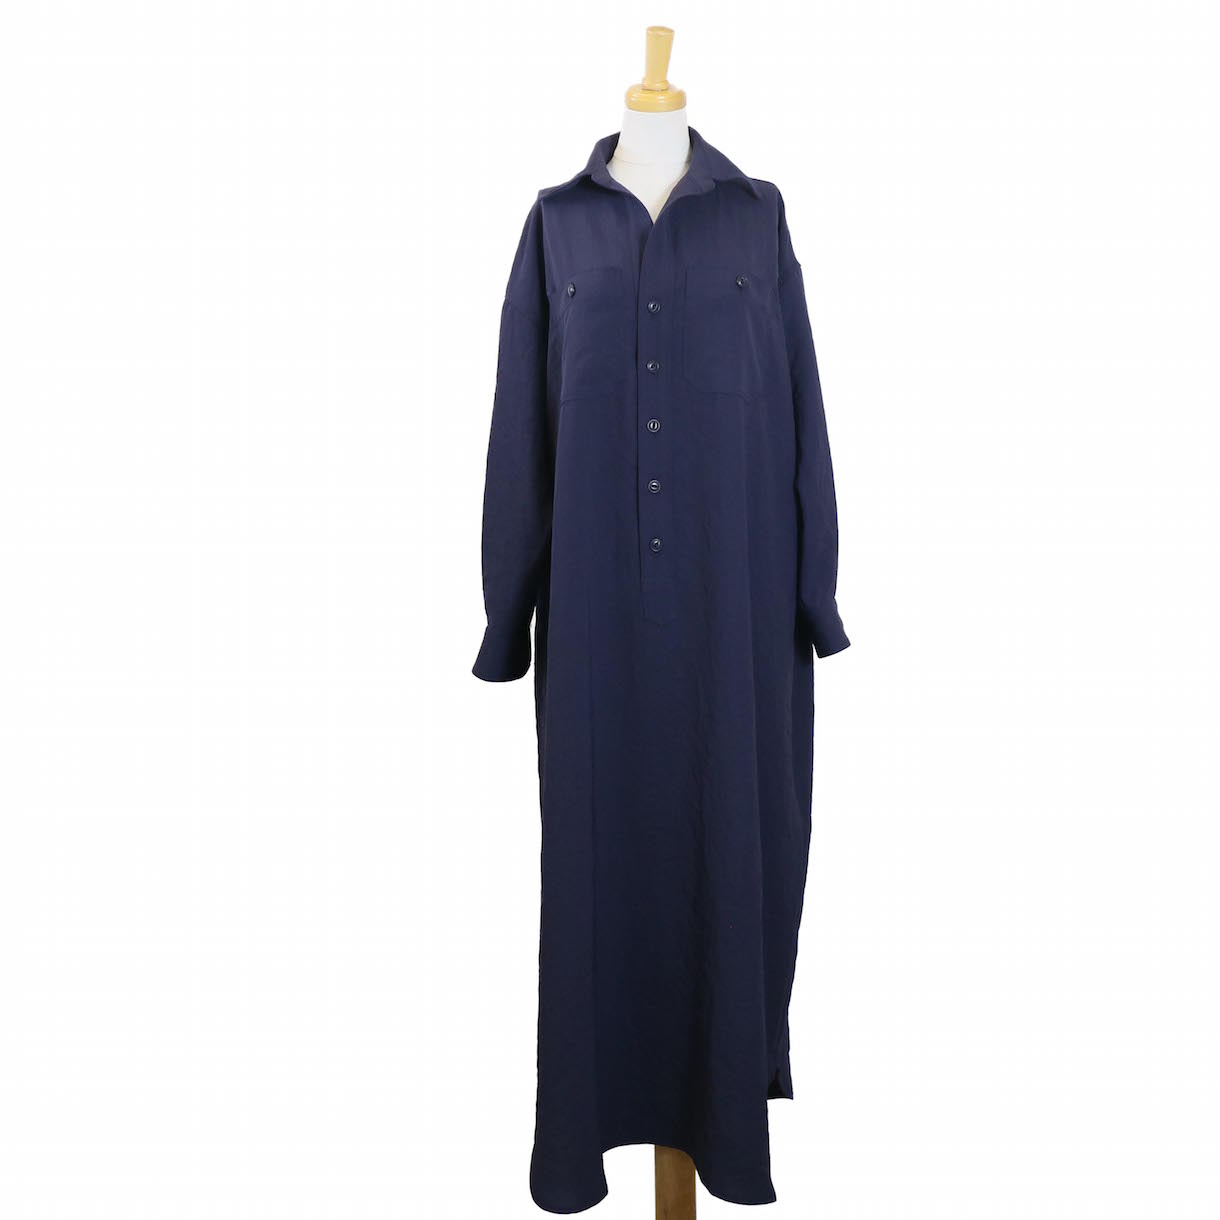 BLUEBIRD BOULEVARD / ドライタッチツイルシャツドレス-NAVY